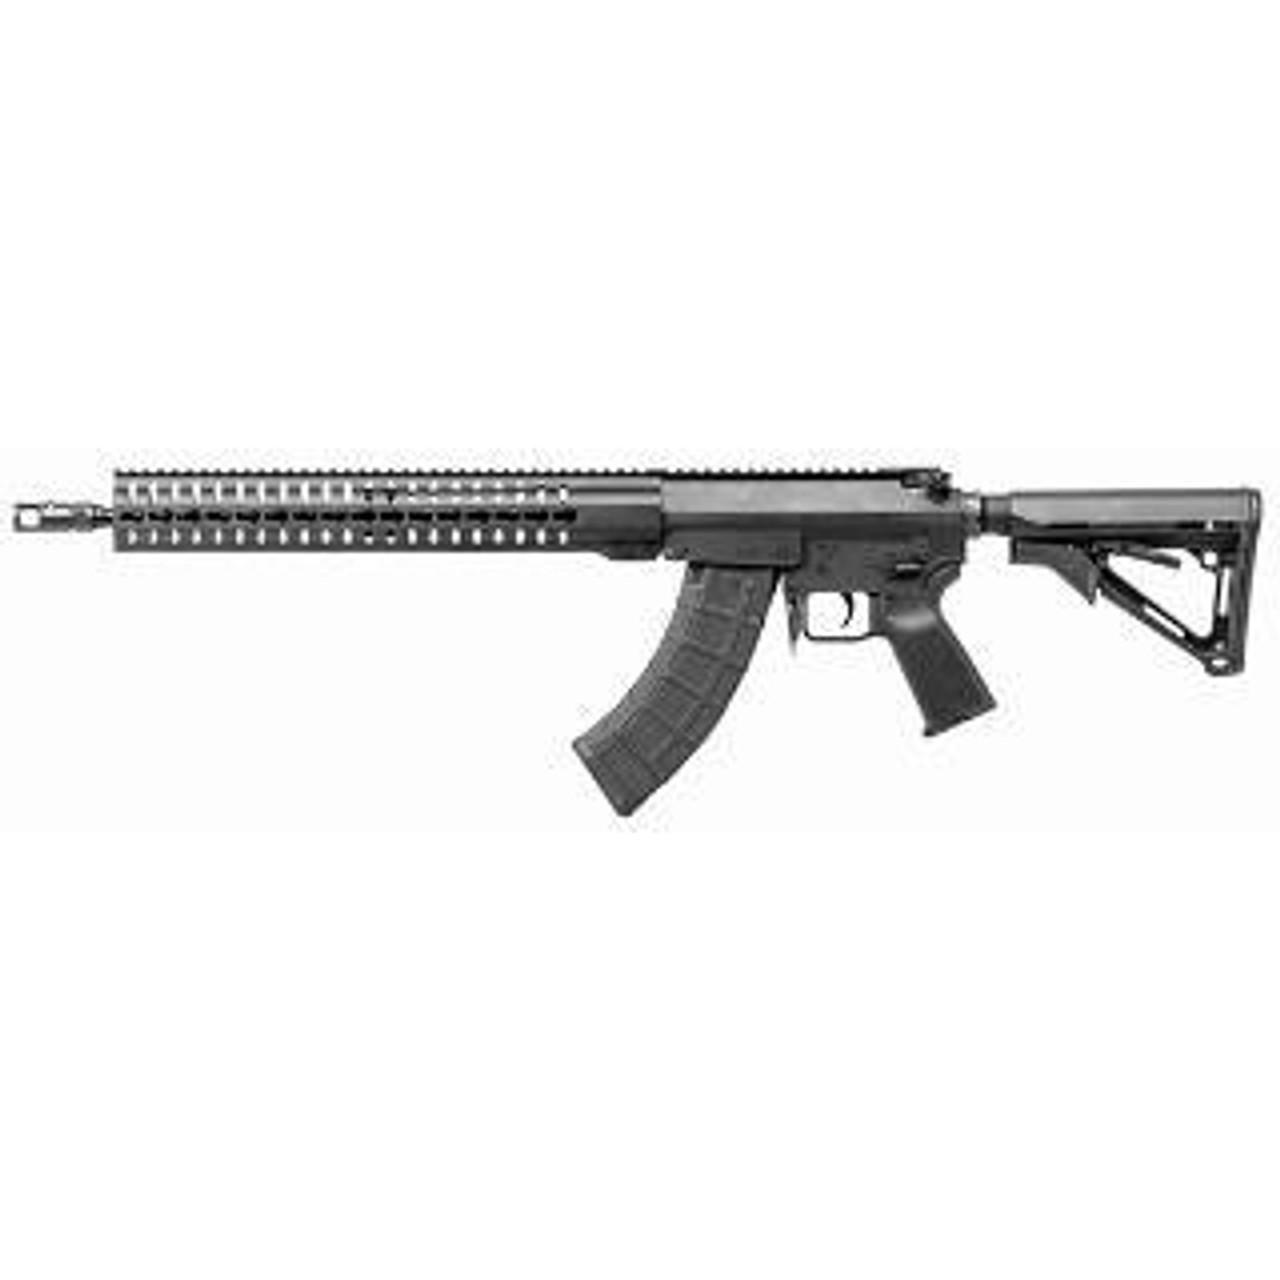 CMMG  MK47 AKM Mutant CALIFORNIA LEGAL-7.62x39